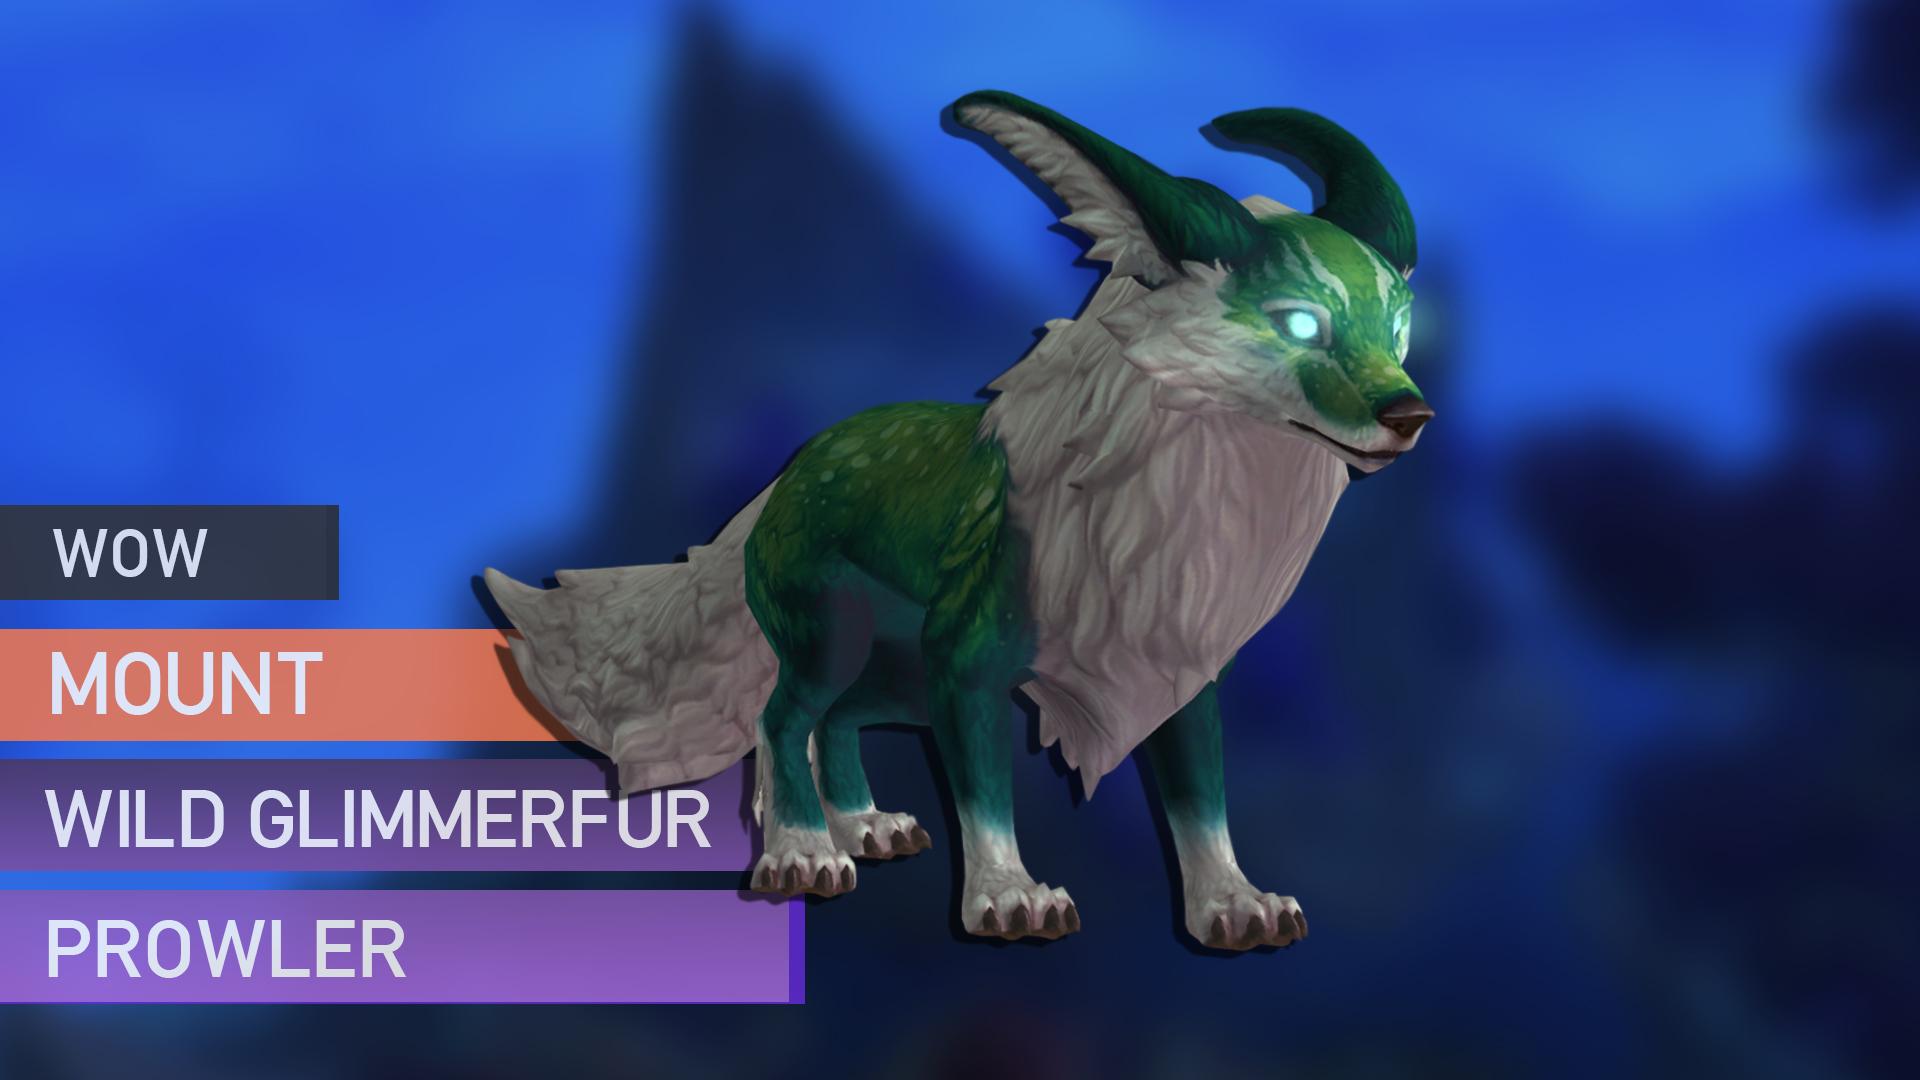 Wild Glimmerfur Prowler mount Sedovlasiy - e2p.com